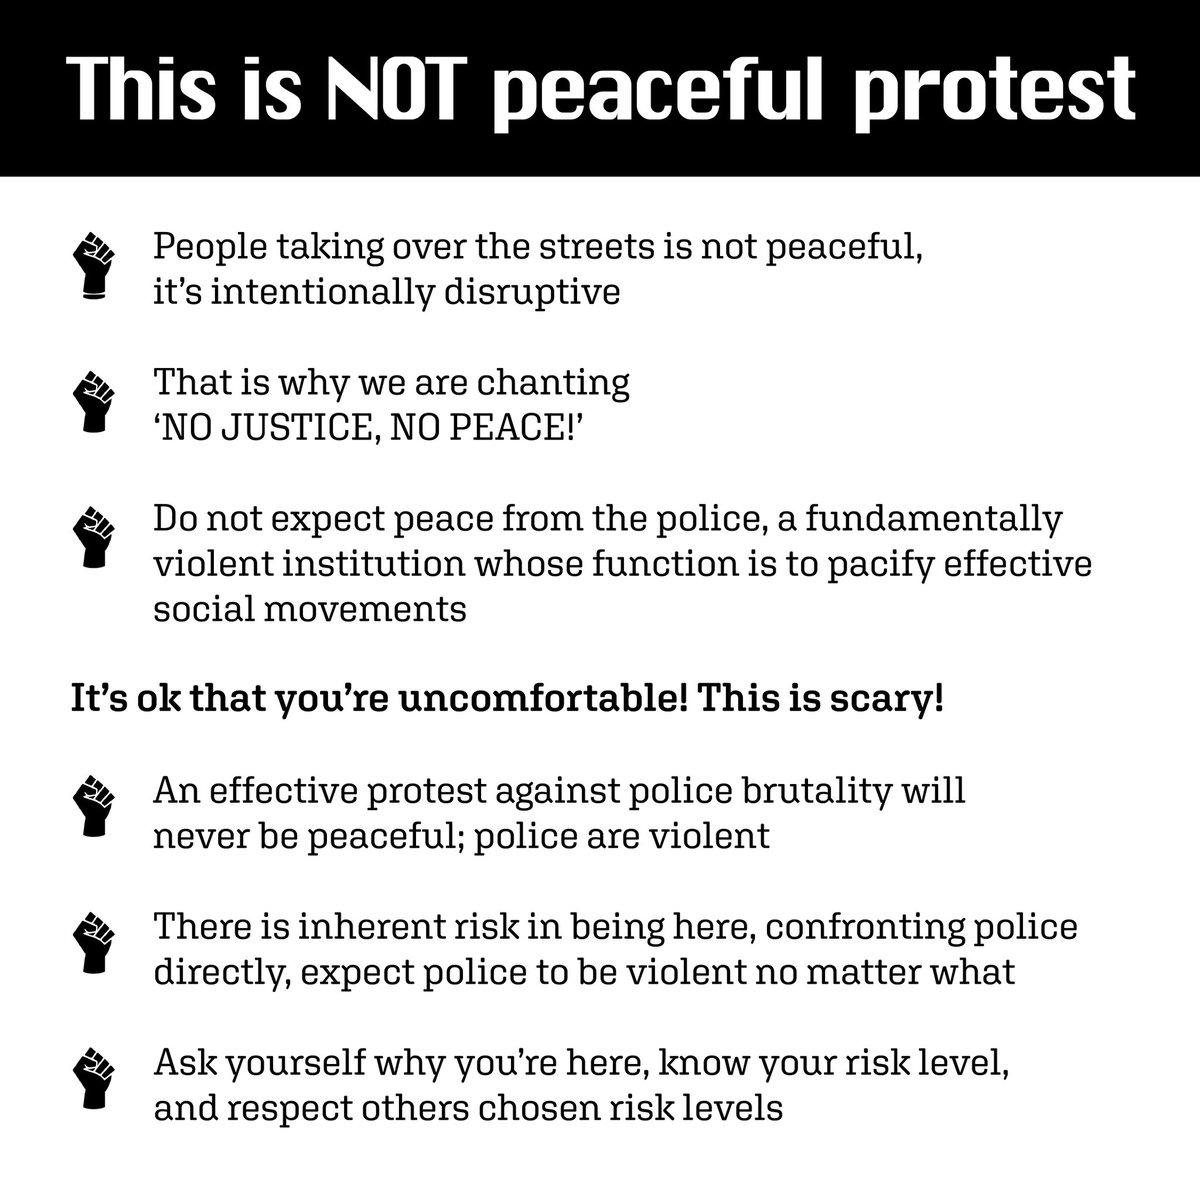 IMPORTANT 2.0 #portlandprotest #defendpdx #acab #NoJusticeNoPeace https://t.co/L1mBmf05D3